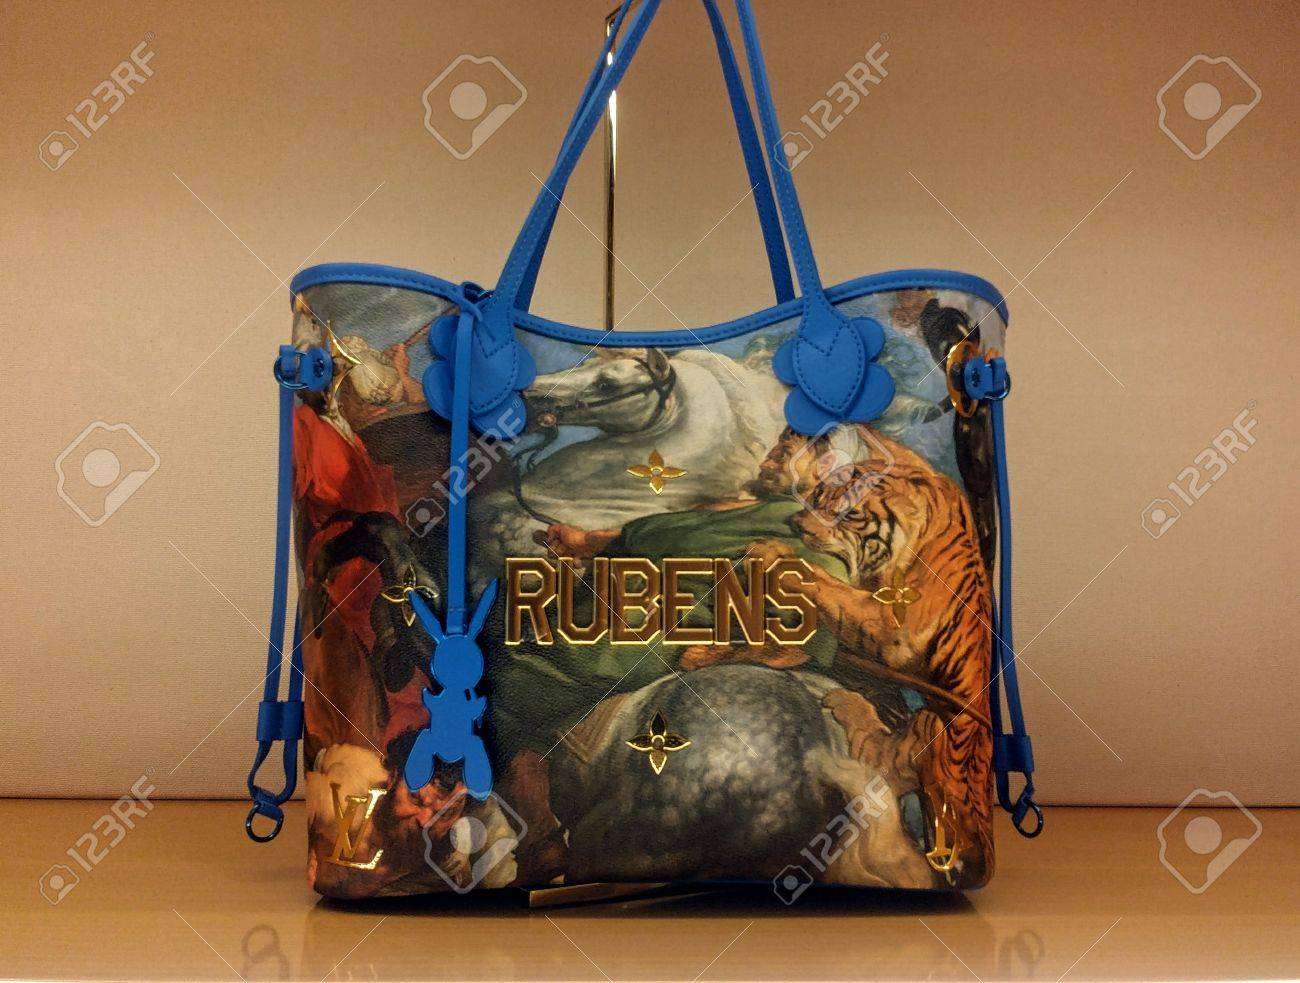 e596b148e3a Louis Vuitton Rubens bag on display in Toronto store